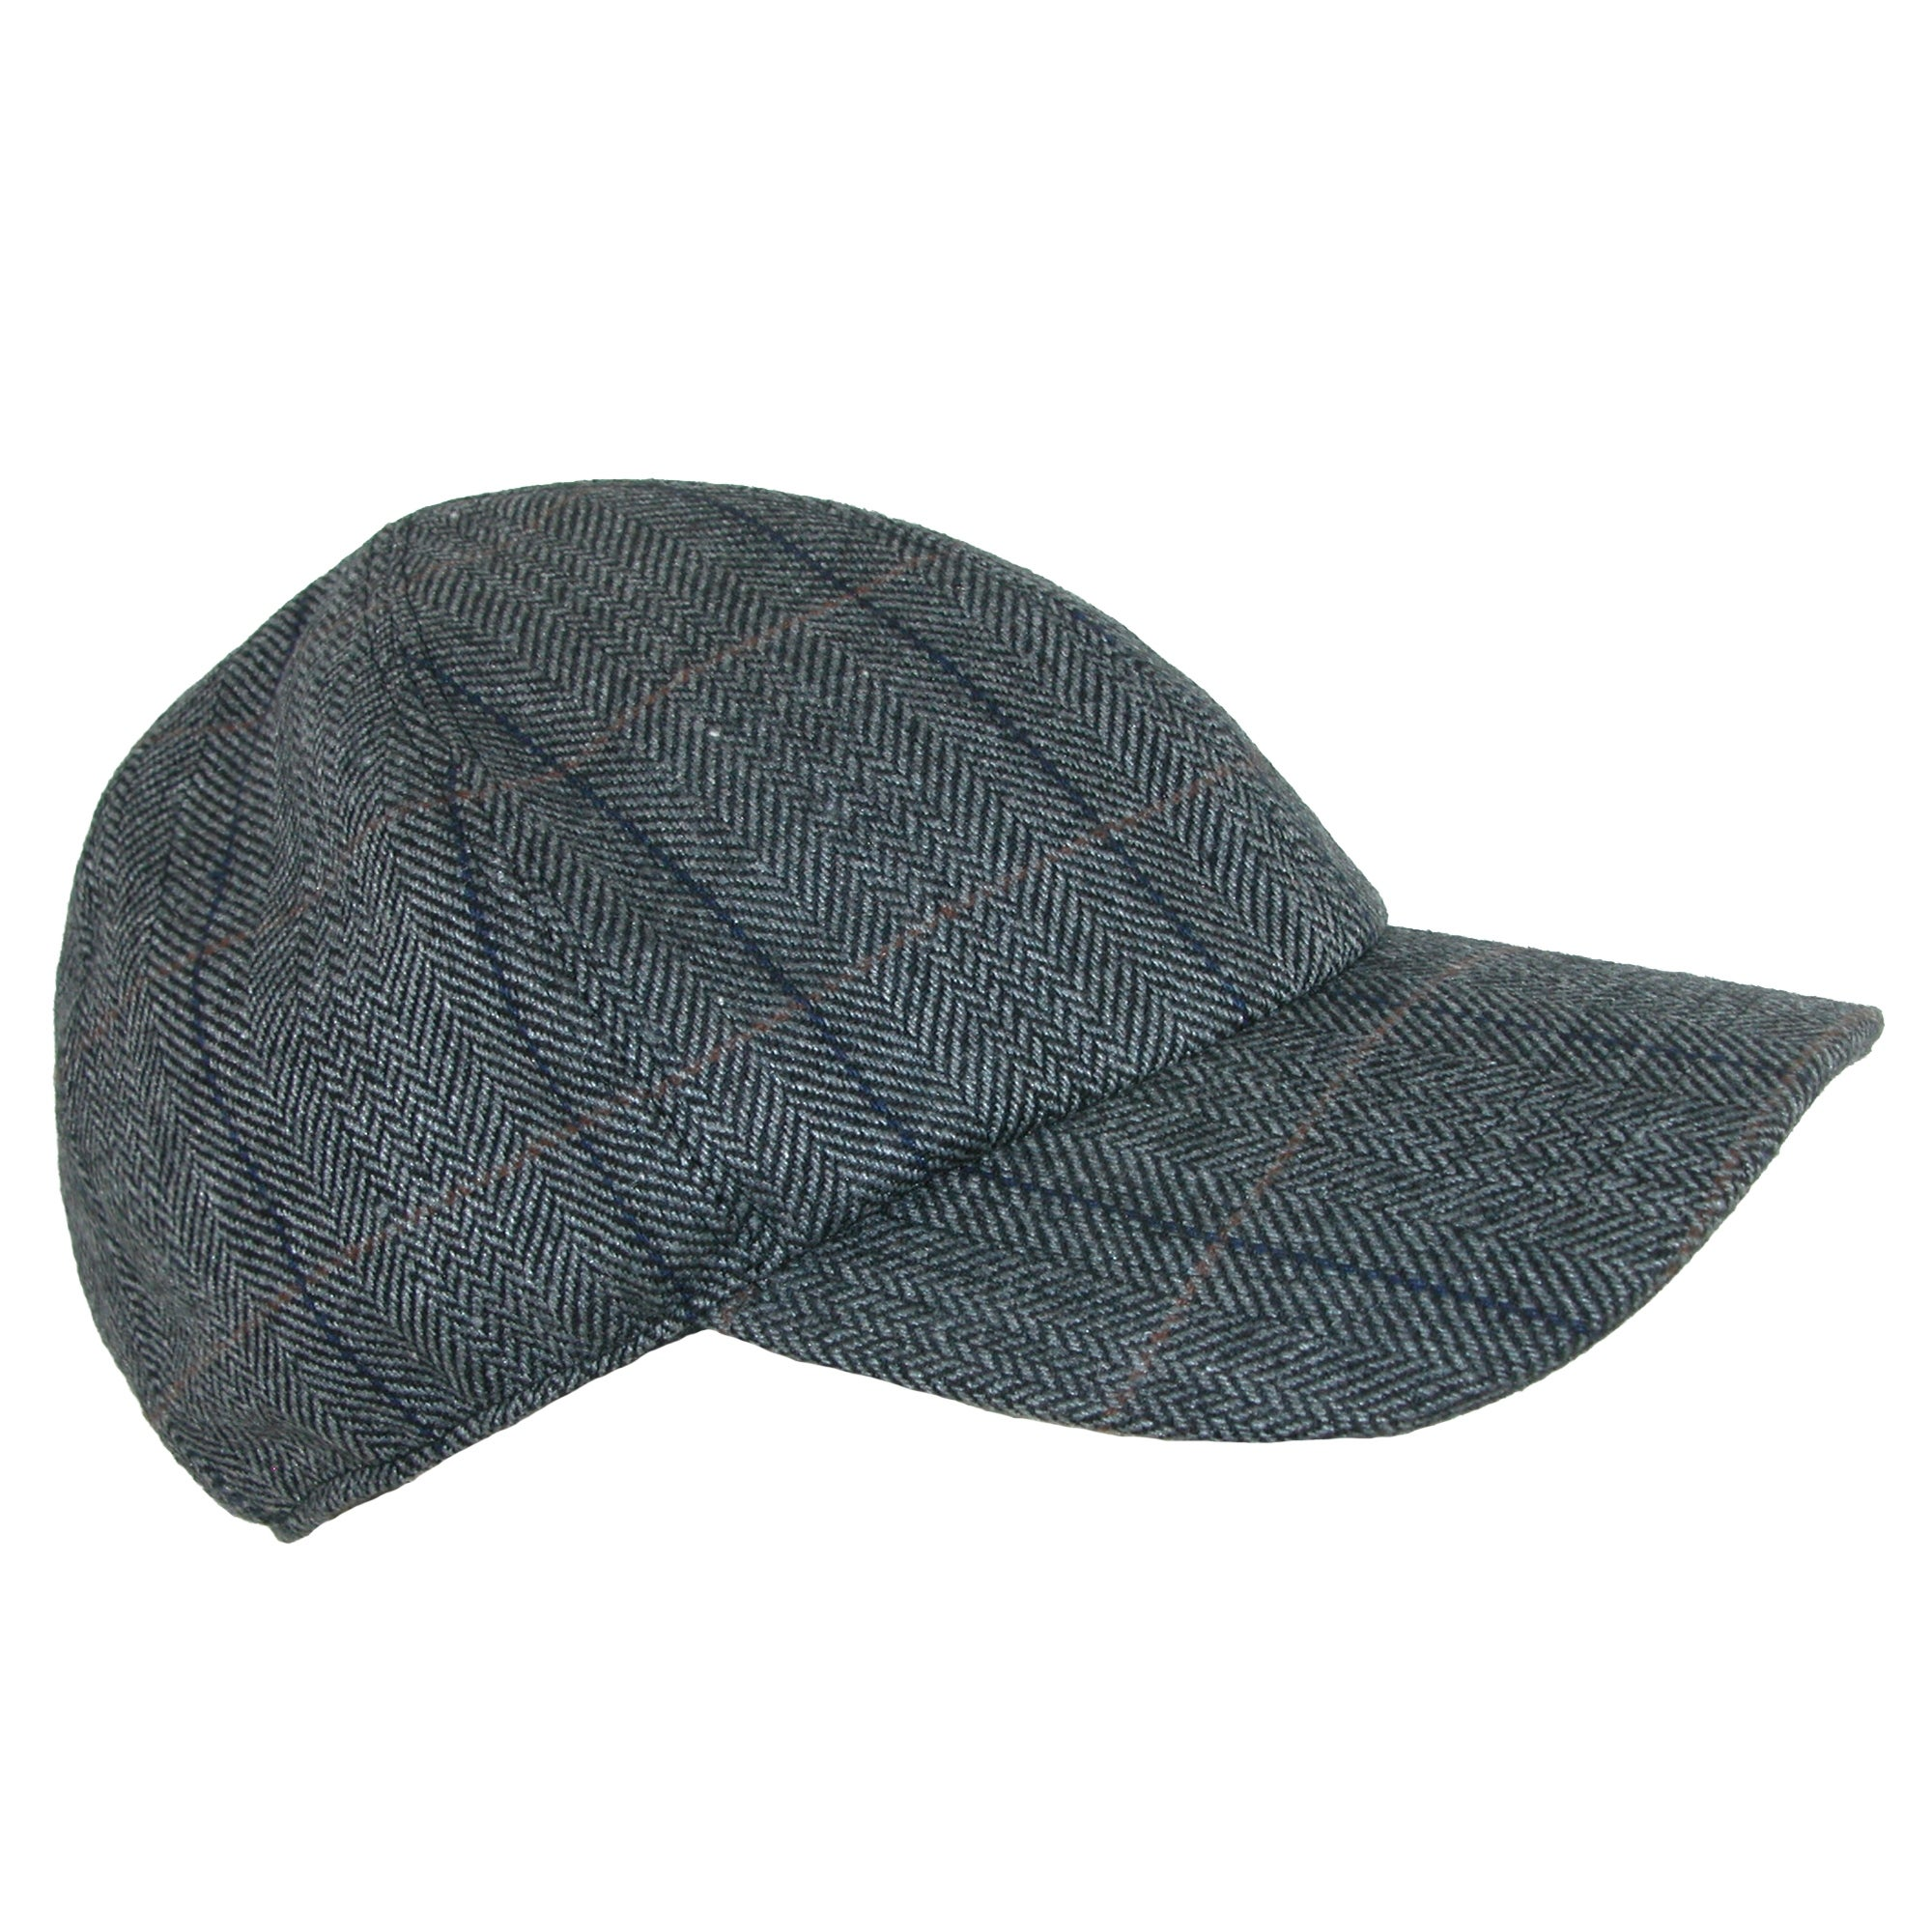 Shop Broner Men s Herringbone Plaid Baseball Cap with Earflaps - Free  Shipping On Orders Over  45 - Overstock - 17654228 148dd2d6b2e2